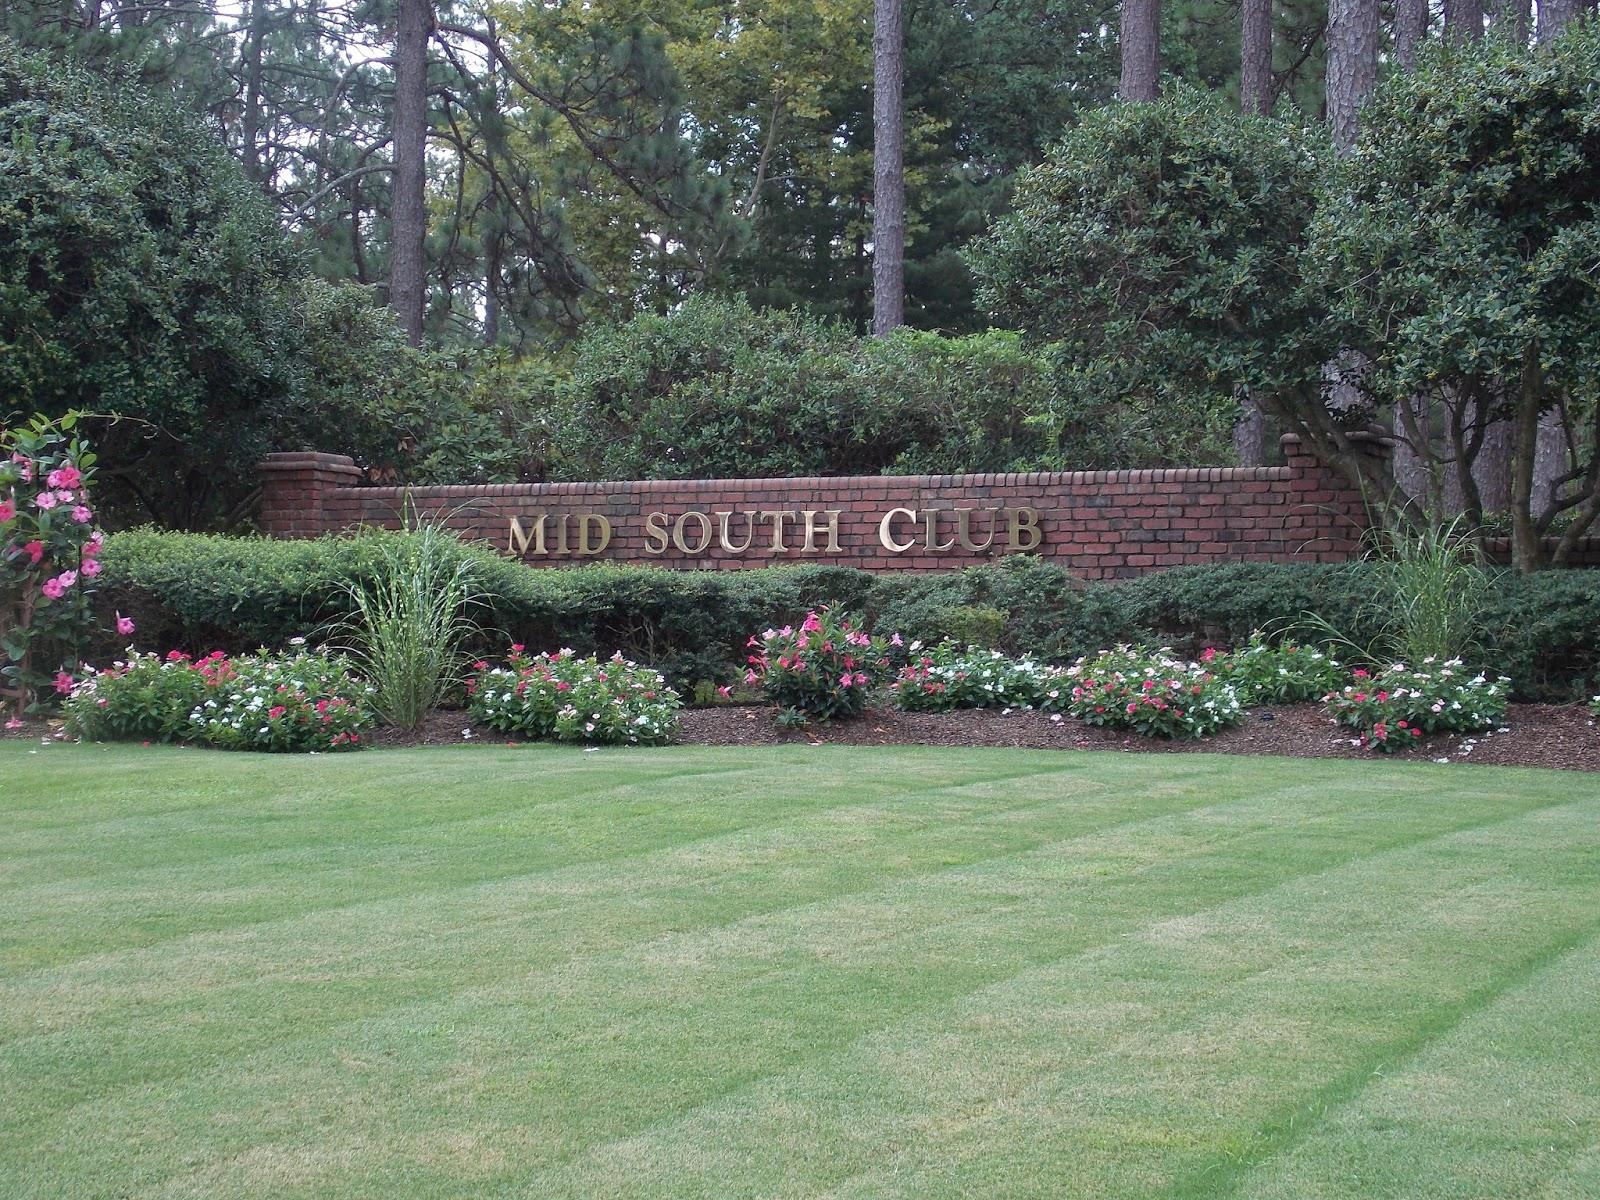 Mid South Club Entrance